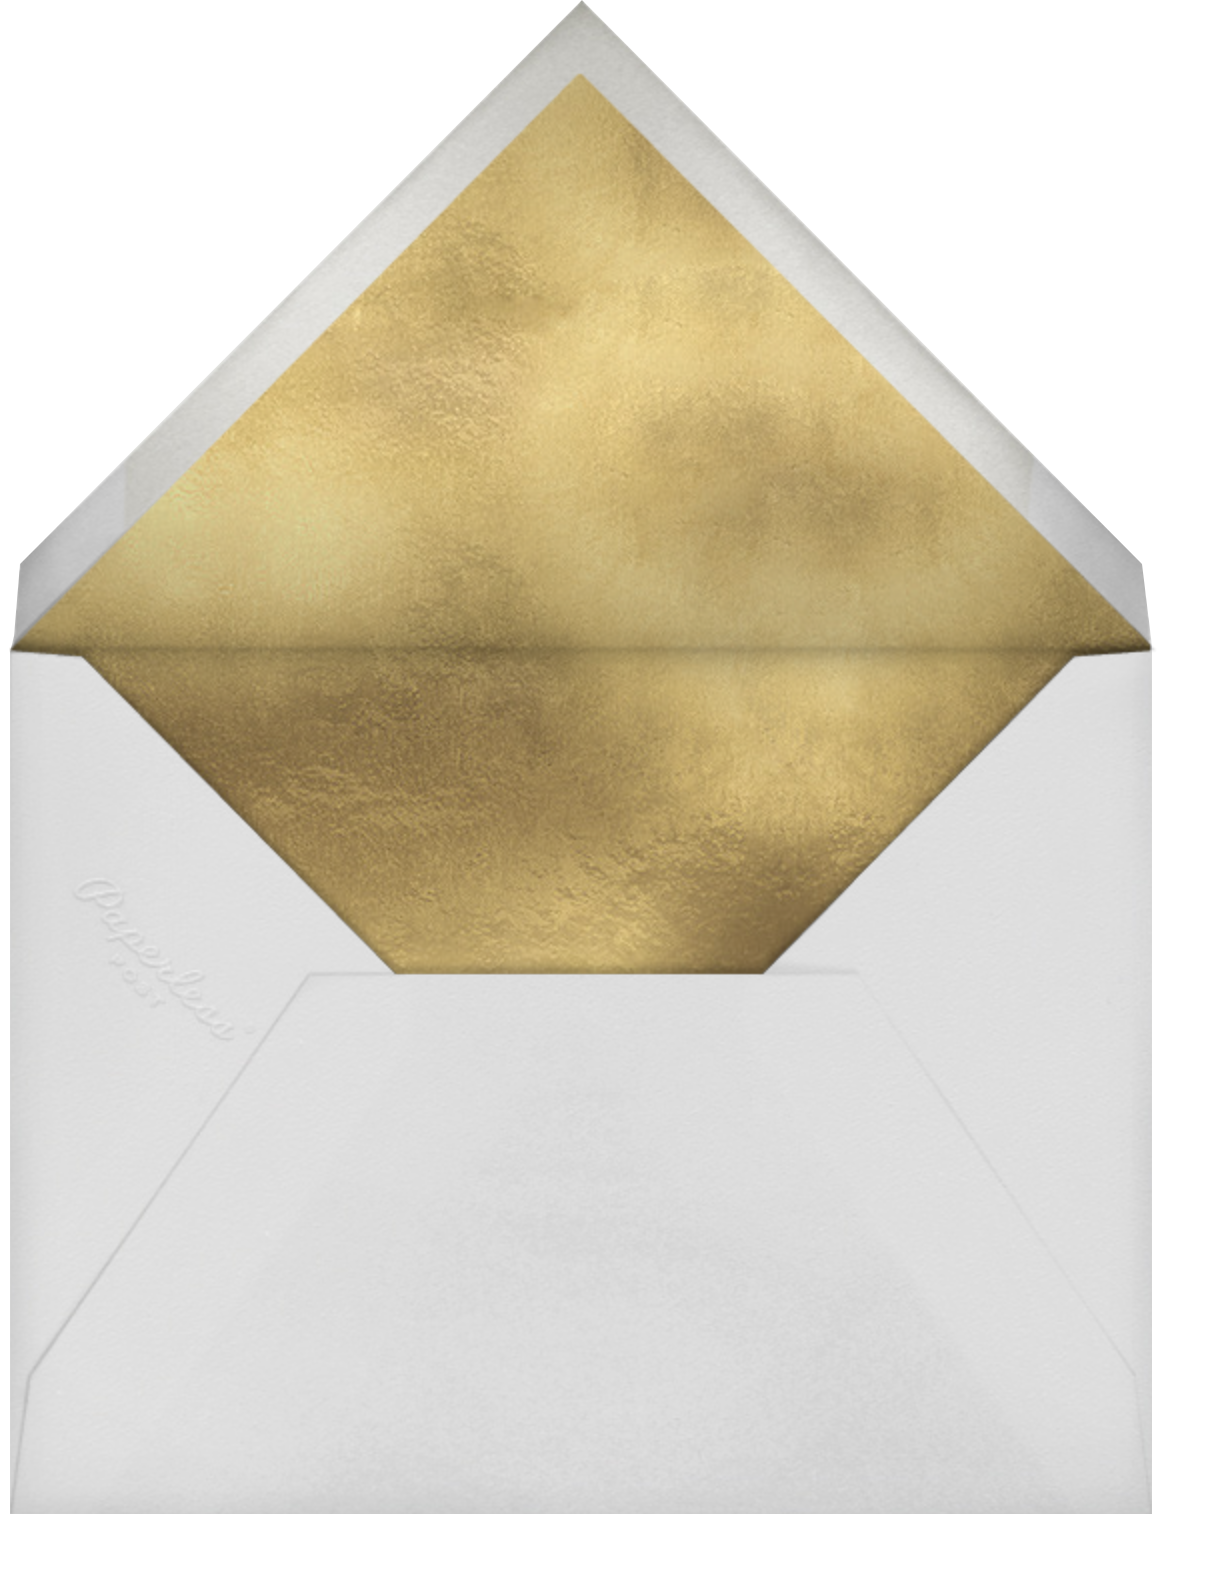 Magic Rabbit - Meri Meri - Kids' birthday - envelope back